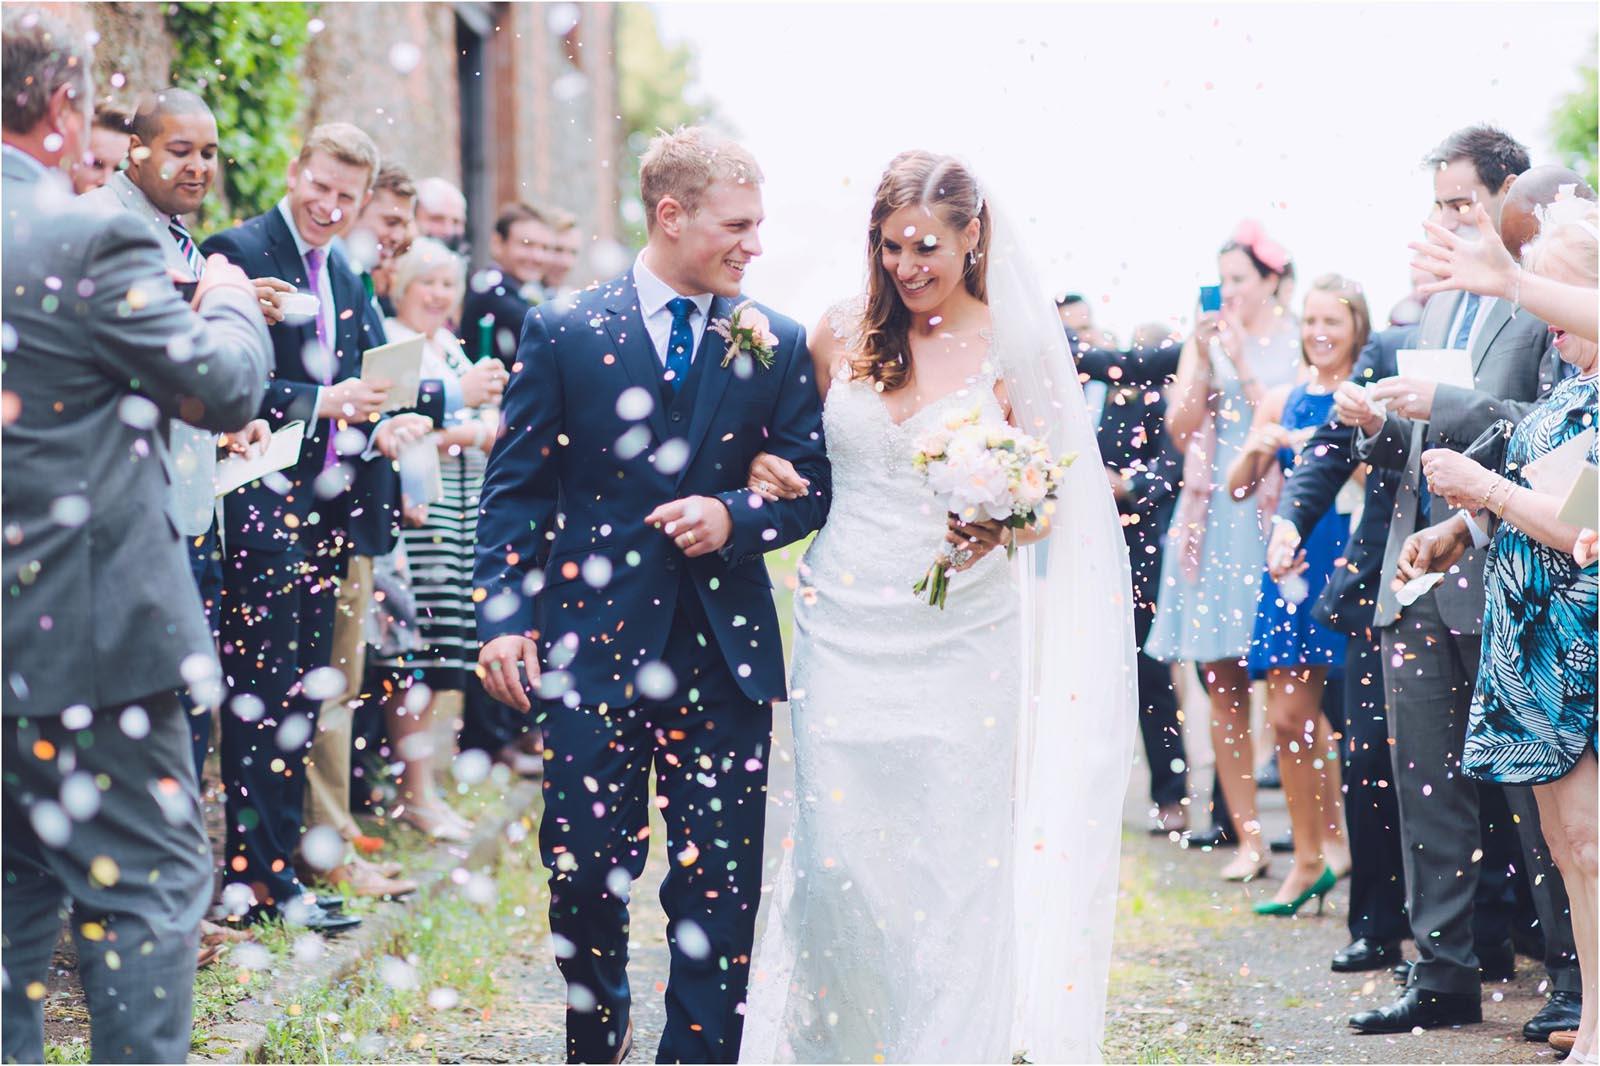 Simon biffen wedding photography 0074